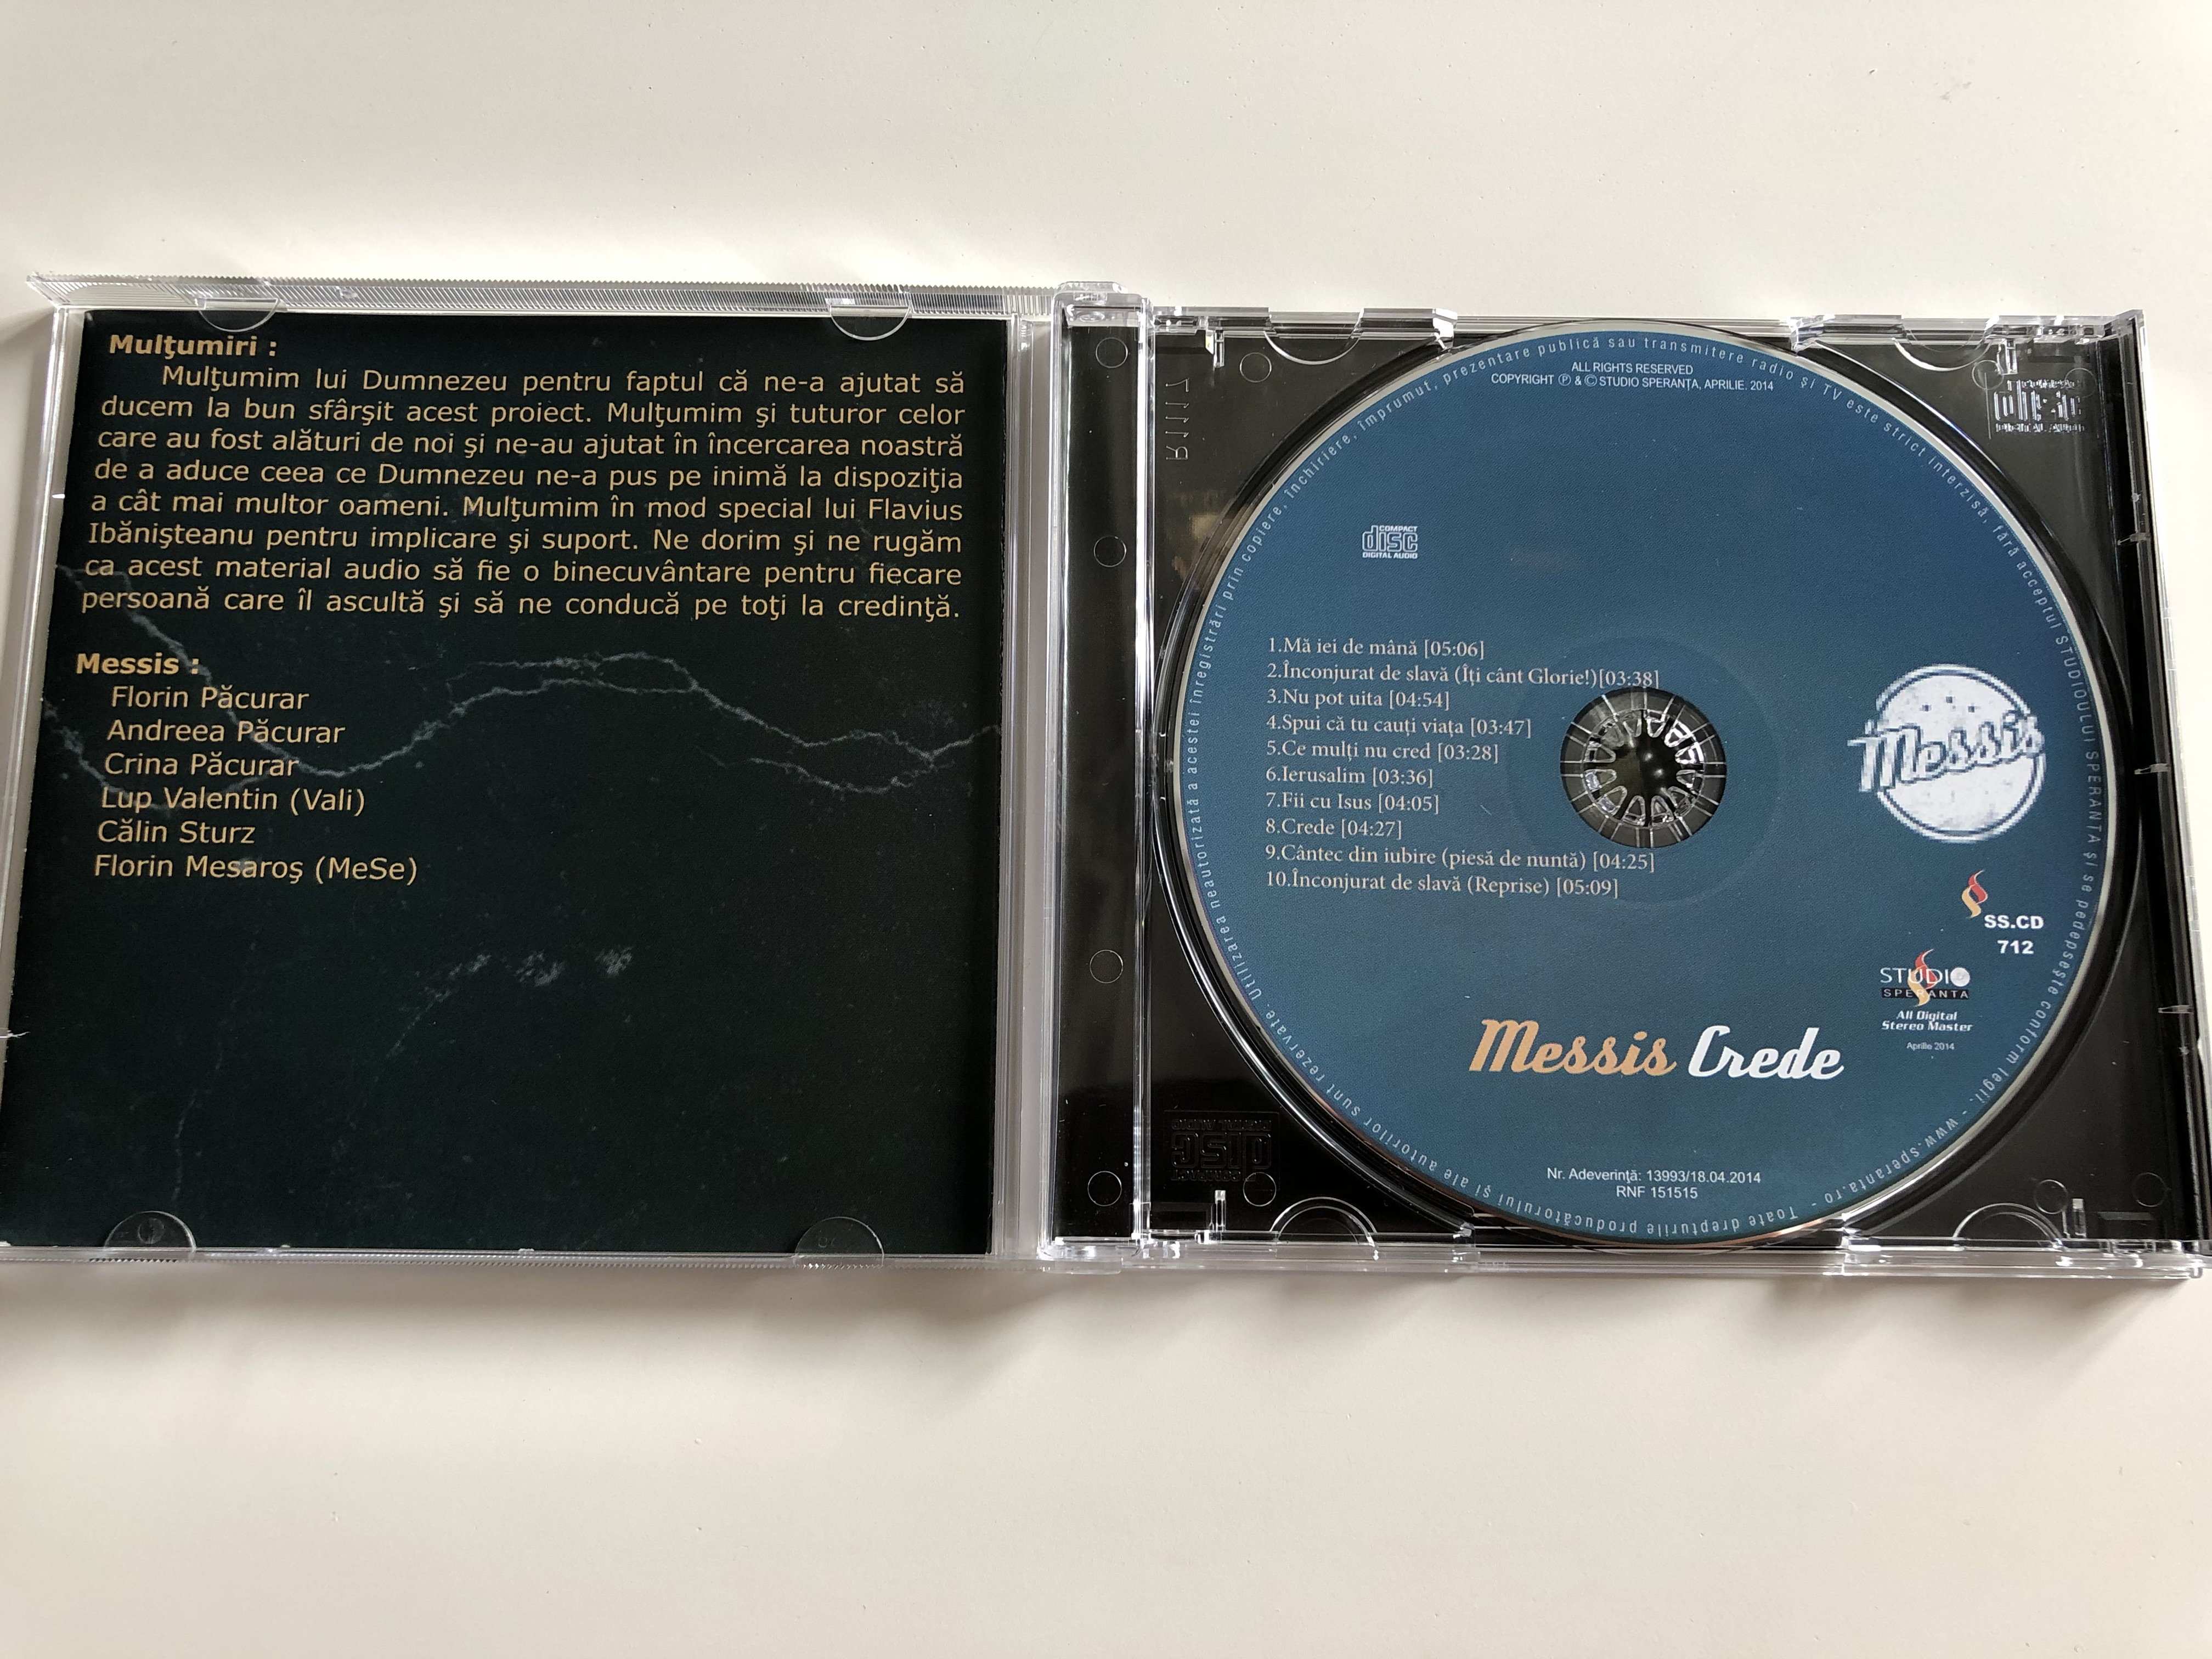 crede-messis-romanian-christian-worship-music-audio-cd-2014-ss.cd-712-5-.jpg